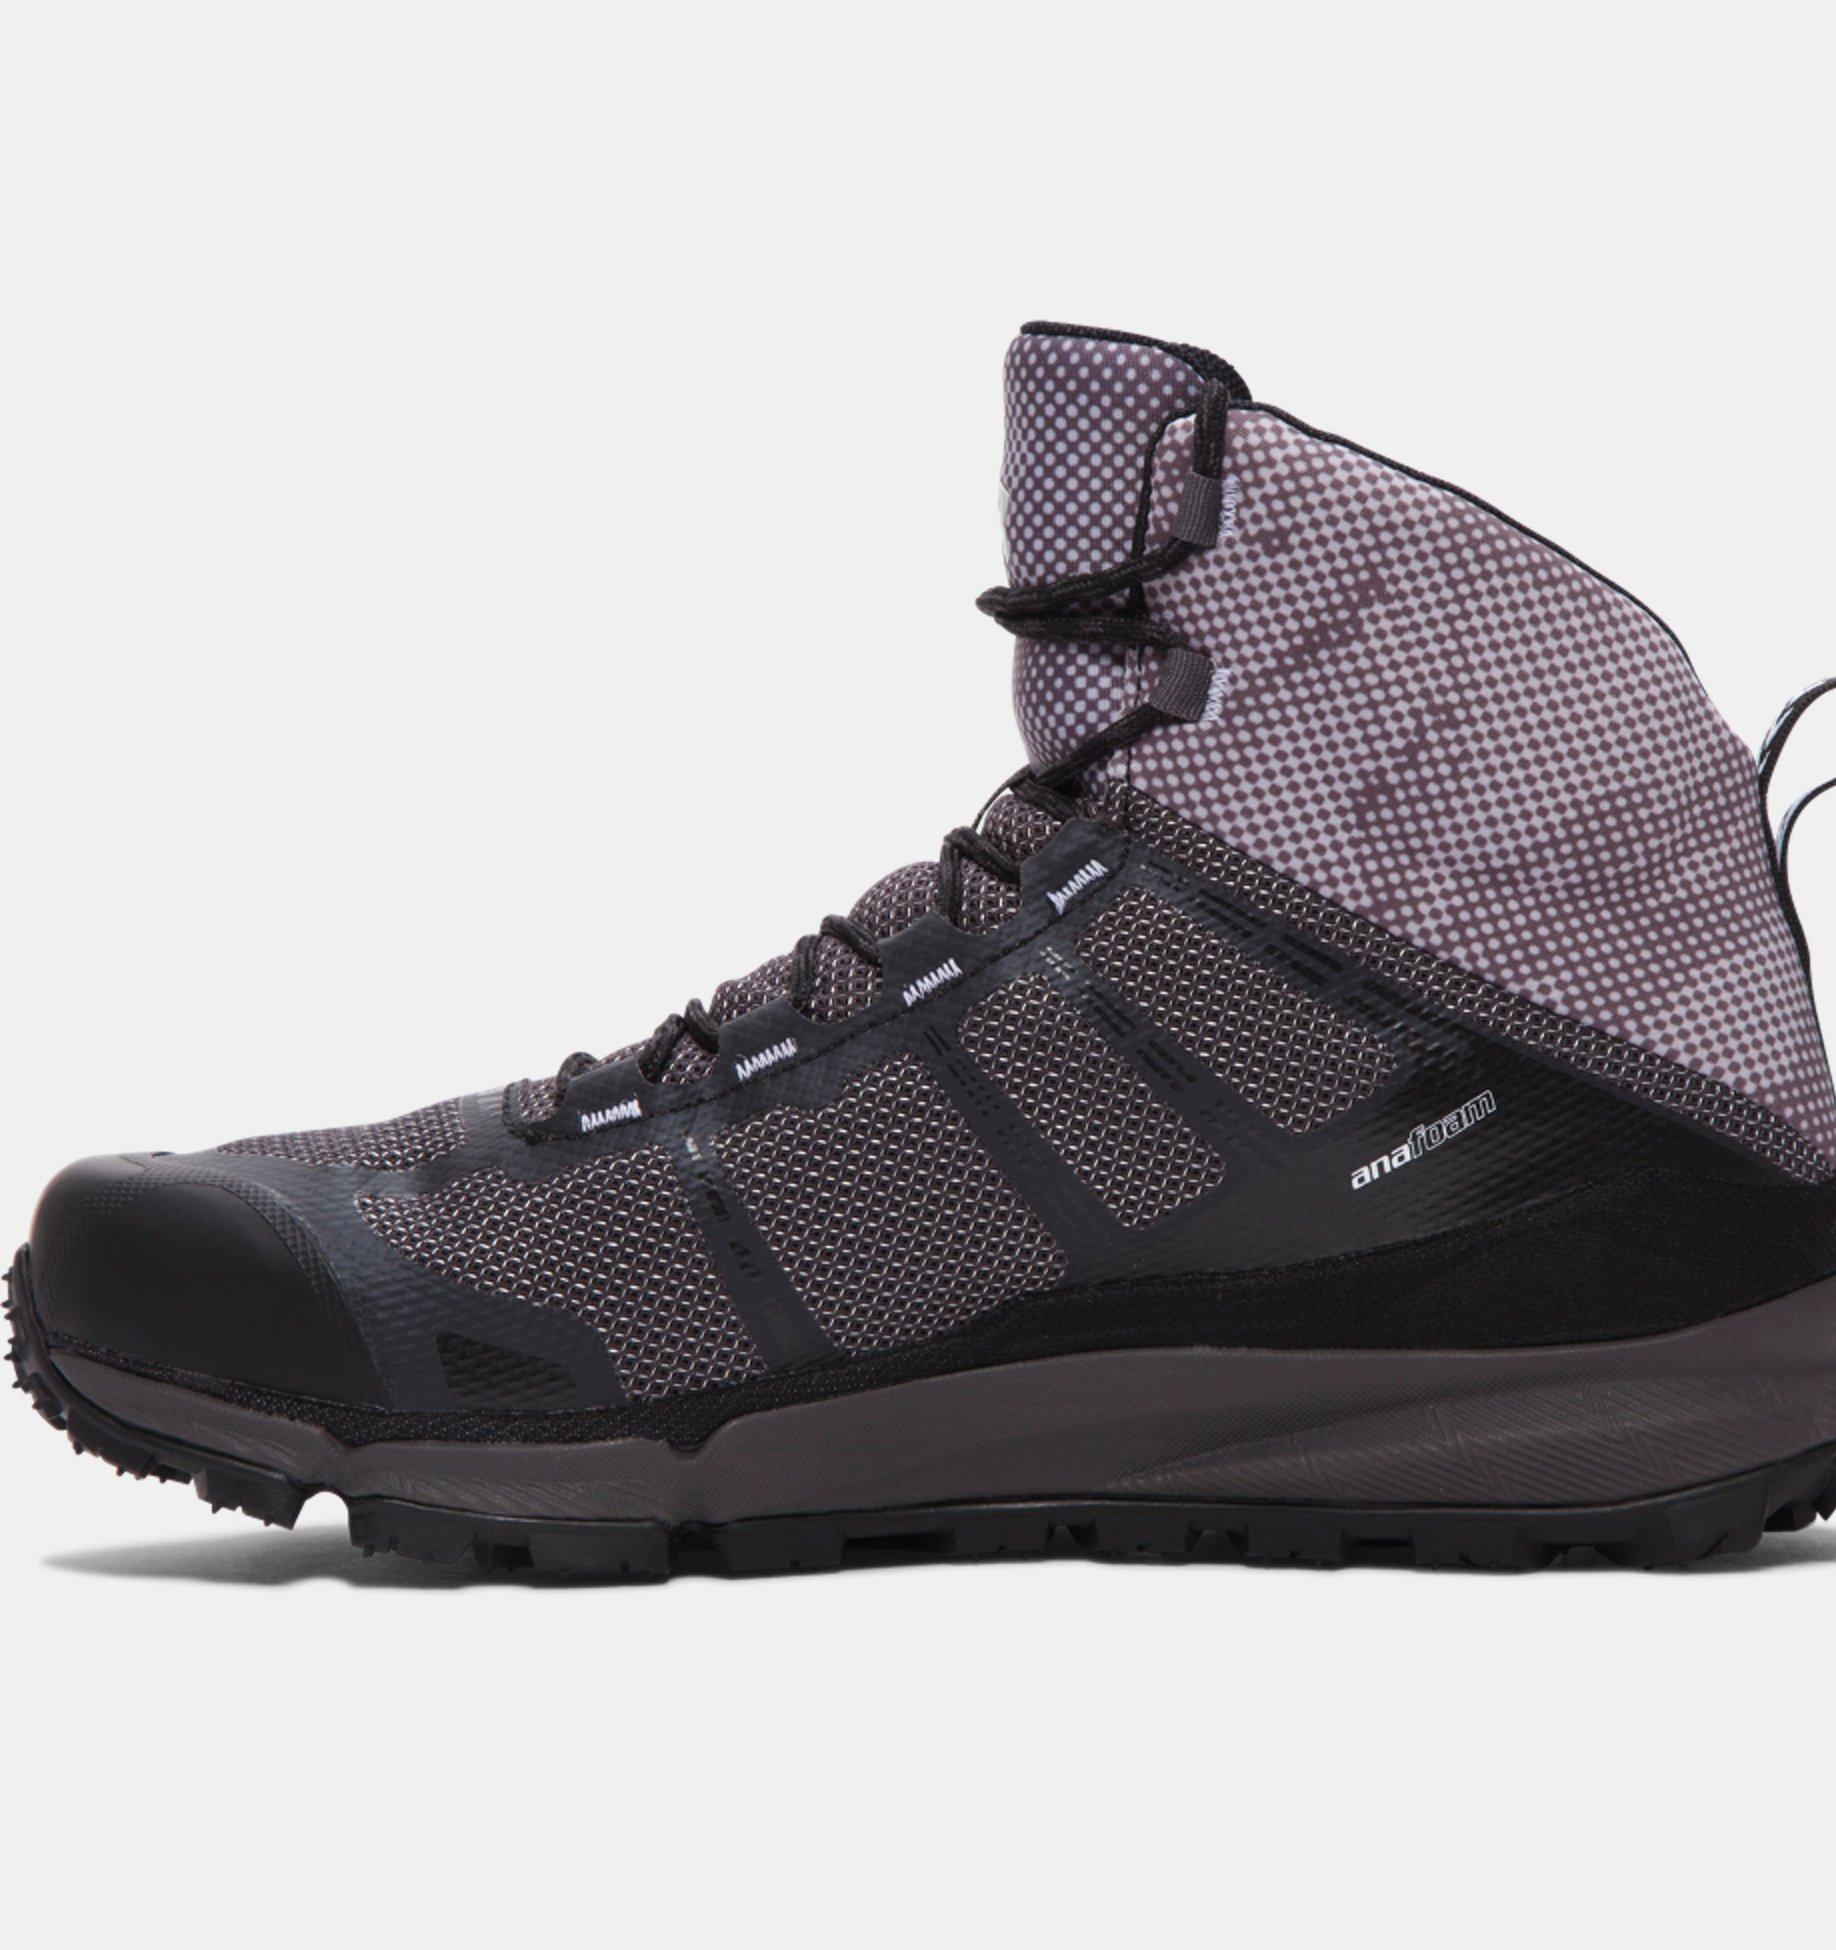 dc5b9218a Men's UA Verge Mid GTX Hiking Boots | Under Armour IE